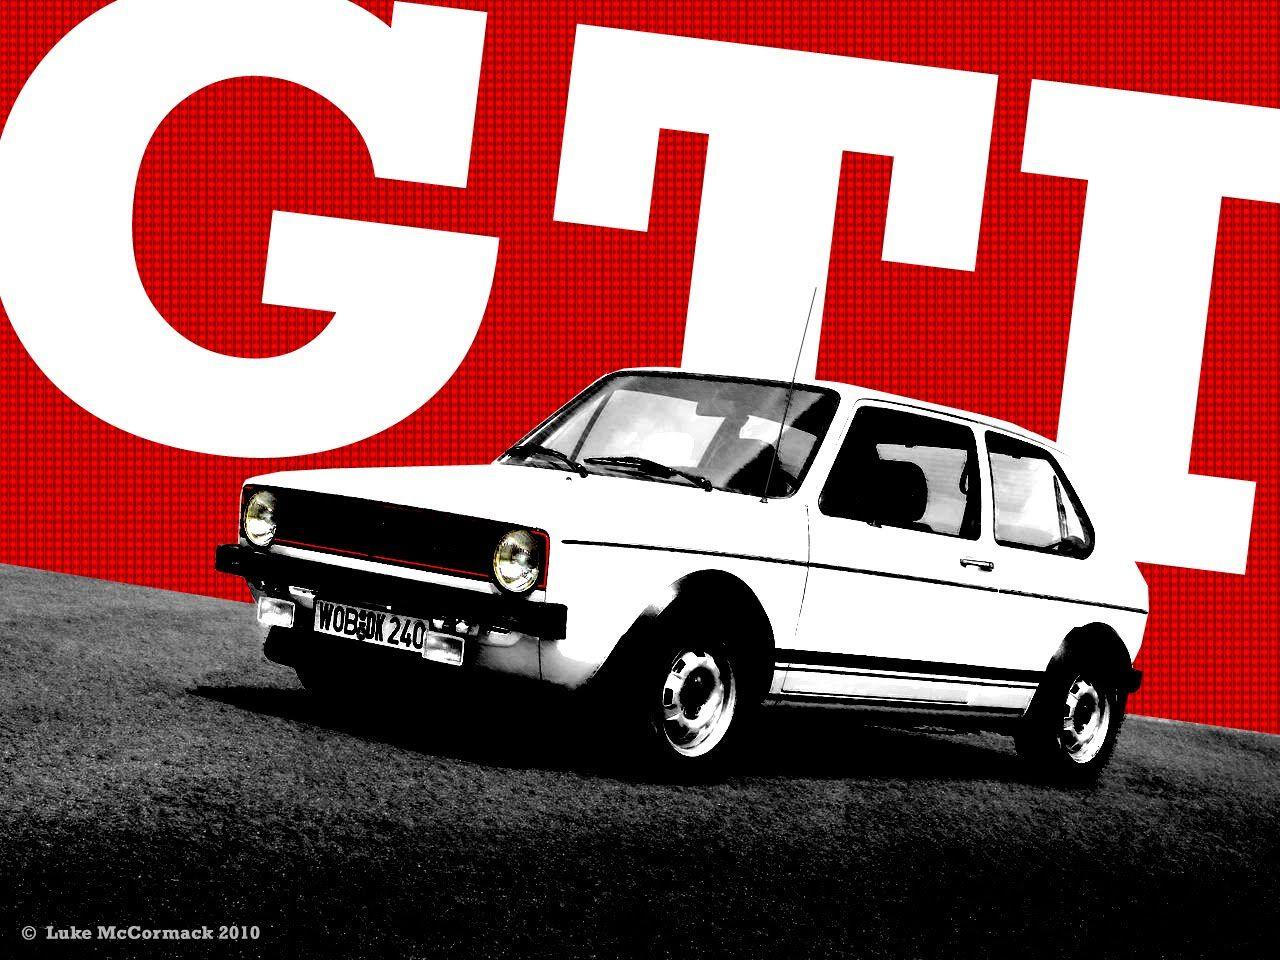 Vw Mk Golf Volkswagen Gti Wallpaper With 1280x960 Resolution